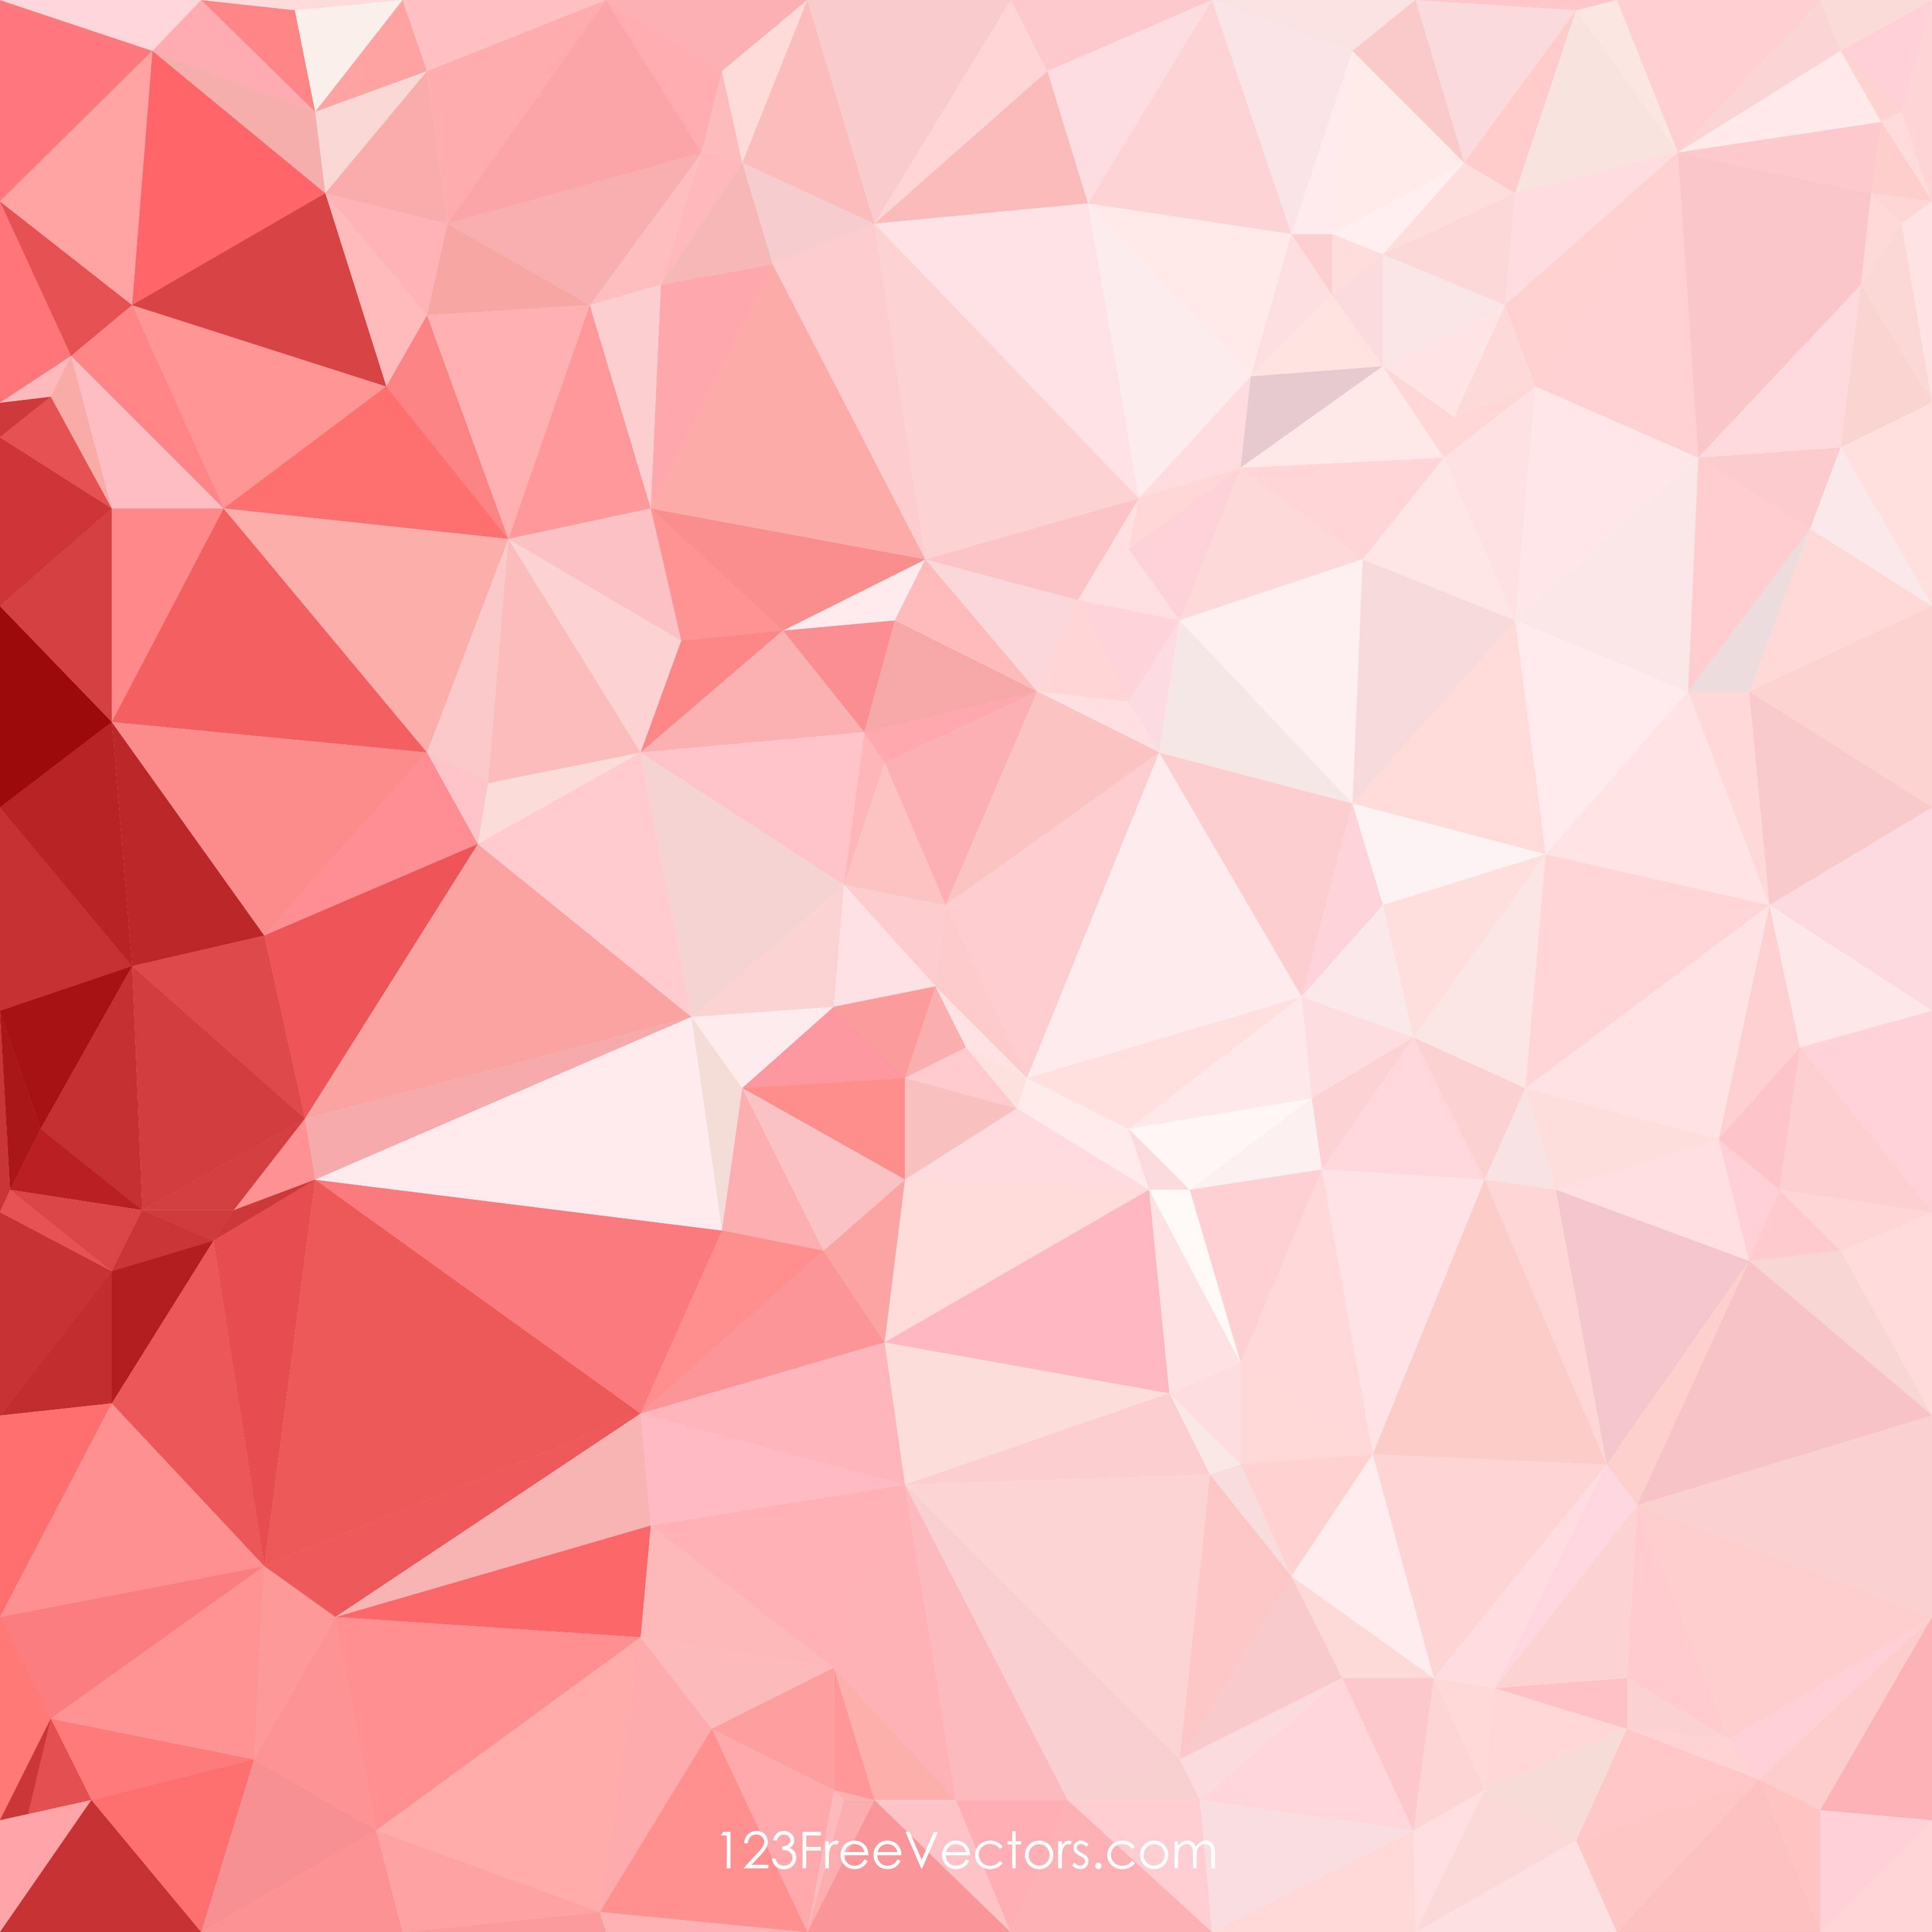 660+ Light Pink Background Vectors | Download Free Vector Art U0026 Graphics |  123Freevectors